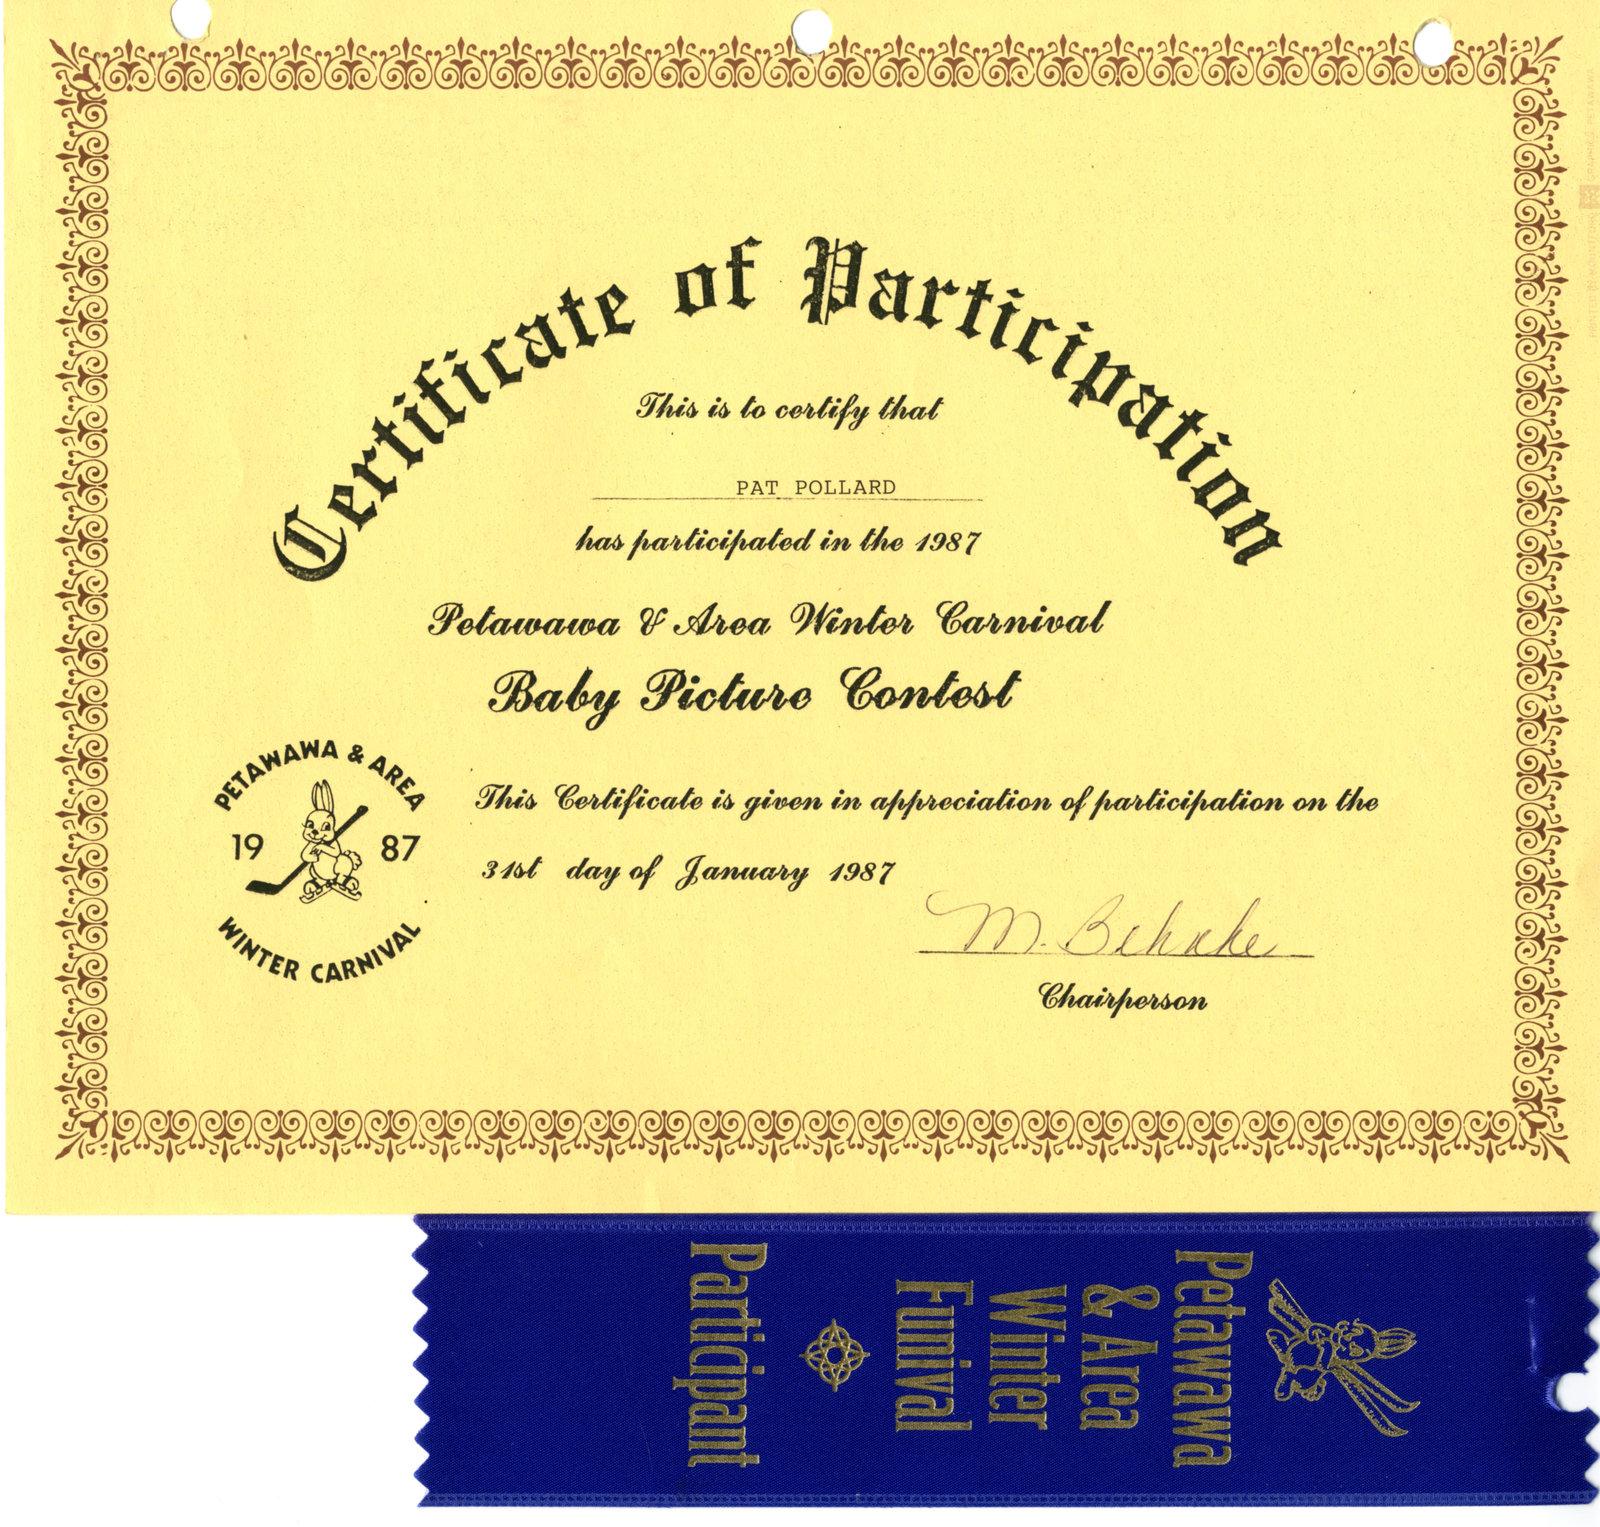 Certificate of Participation to Pat Pollard in the Petawawa & Area 1987 Winter Carnival.